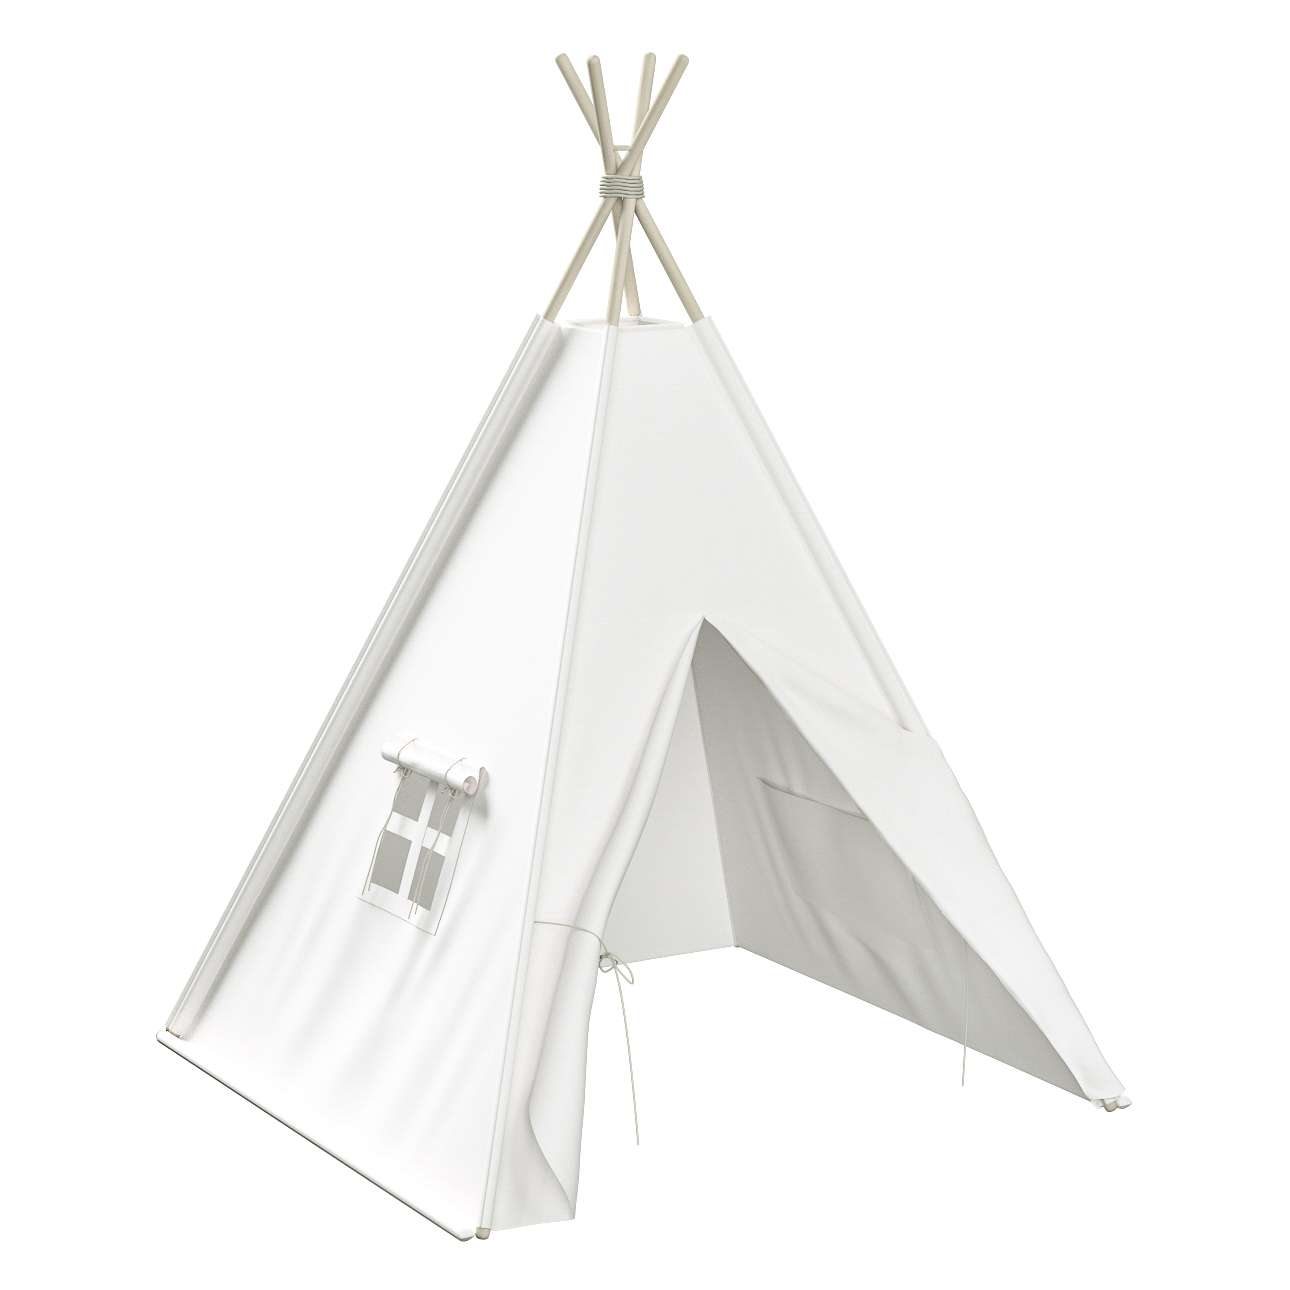 Tipi-Zelt von der Kollektion Cotton Story, Stoff: 702-34